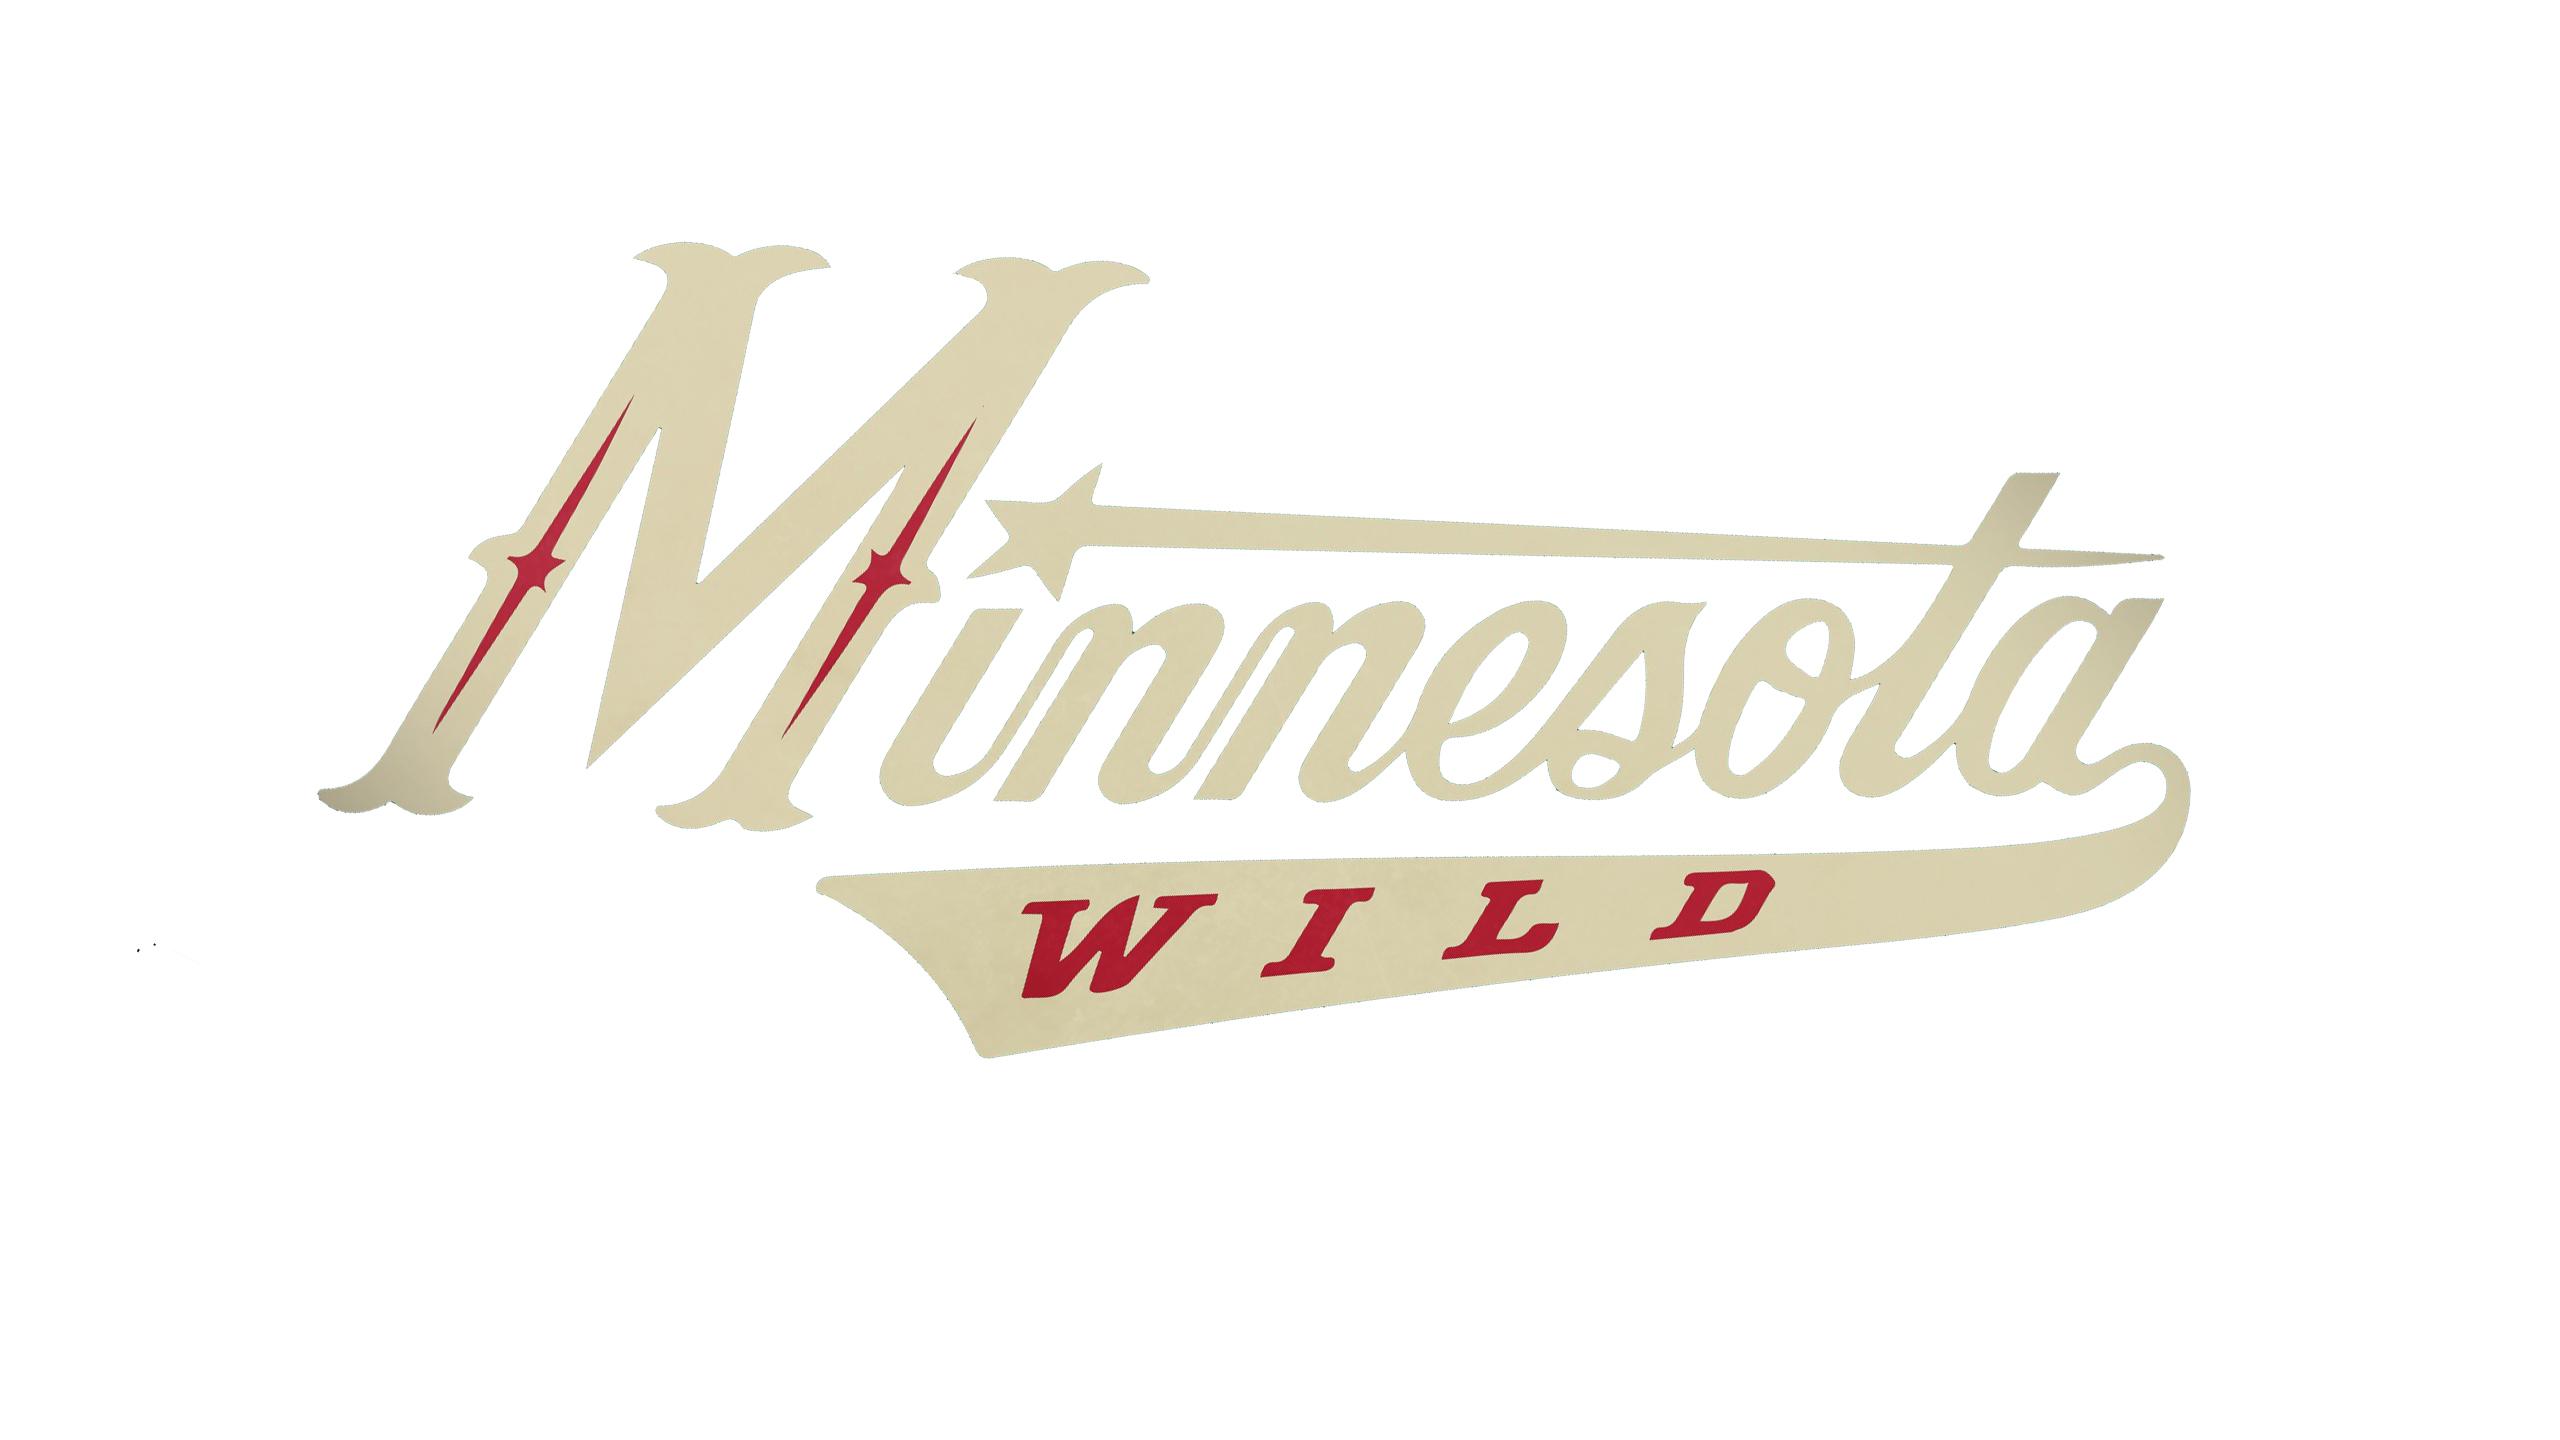 Font Of The Minnesota Wild Logo